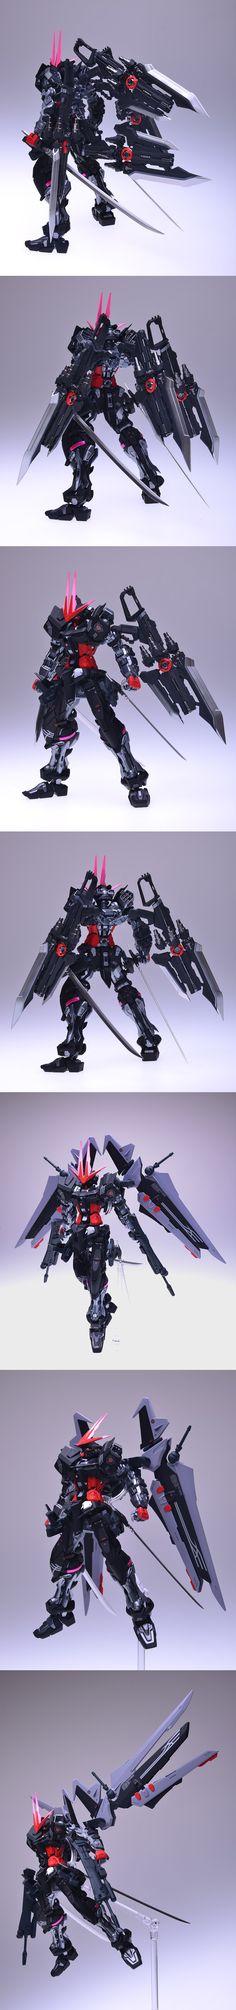 MBF-P0X Gundam Astray Noir: Custom by Kourai80